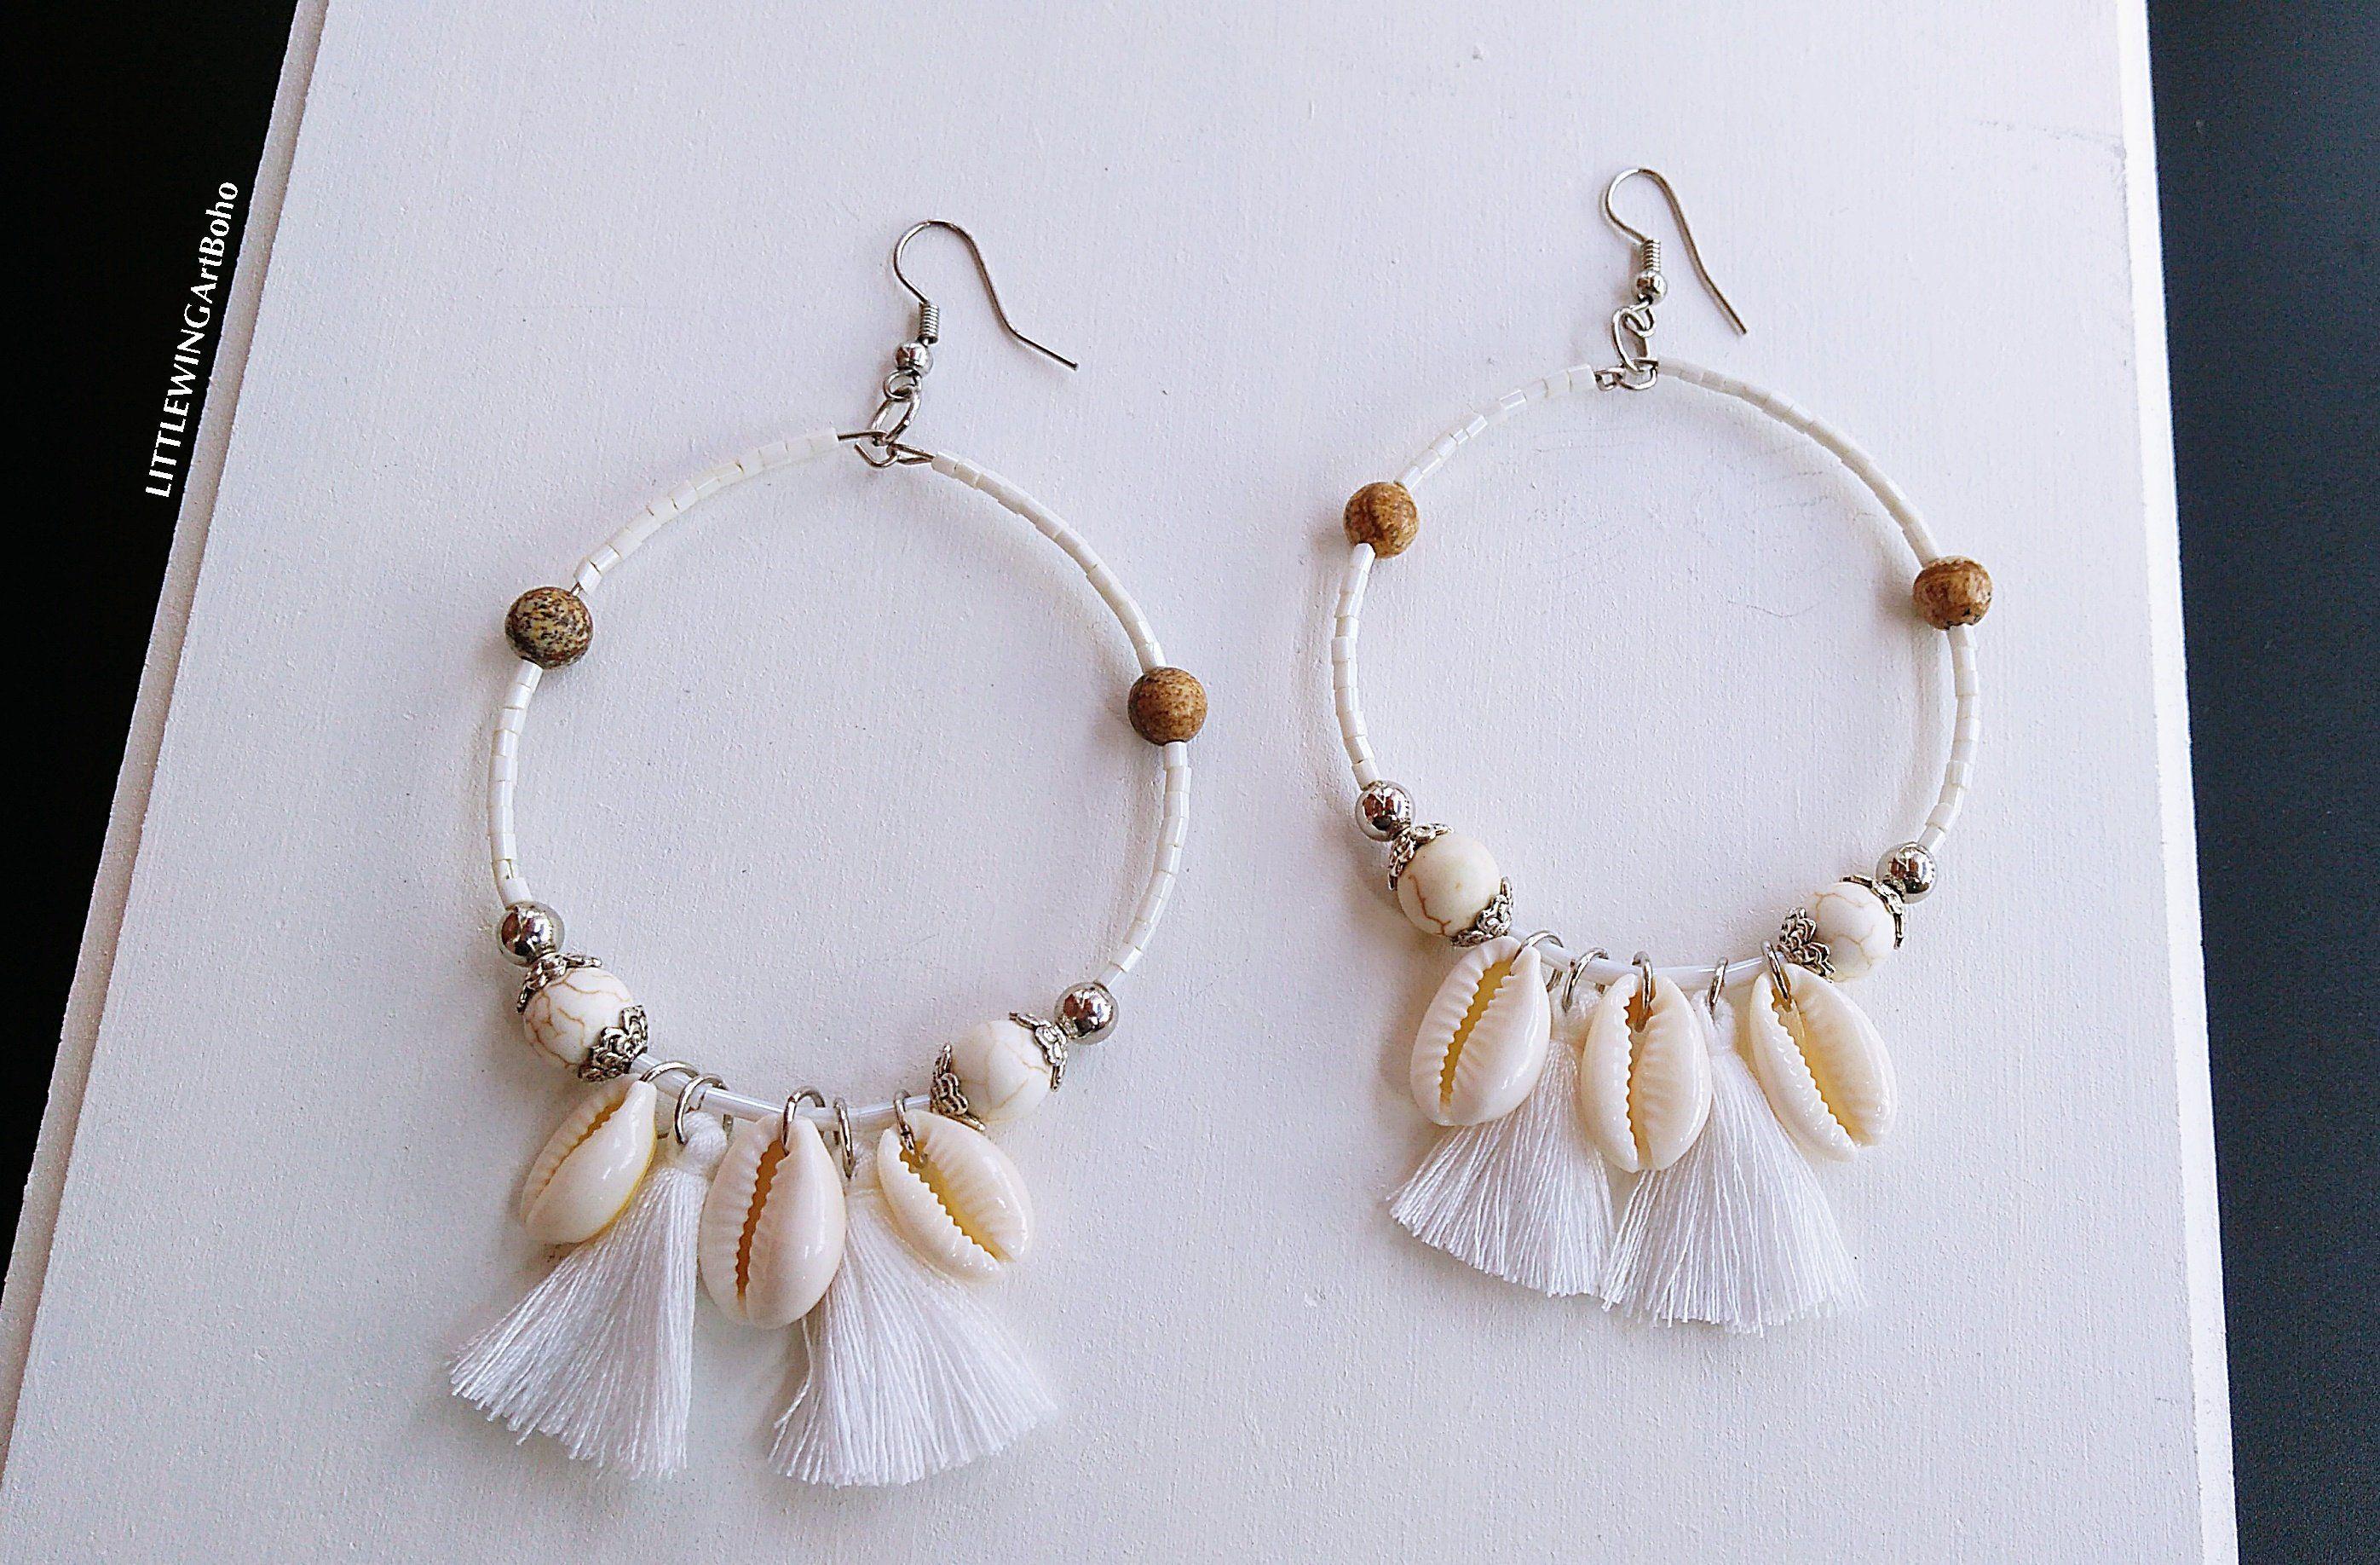 Boho trendy earrings-silver-cowrie shell-white-drop earrings-summer-beachy